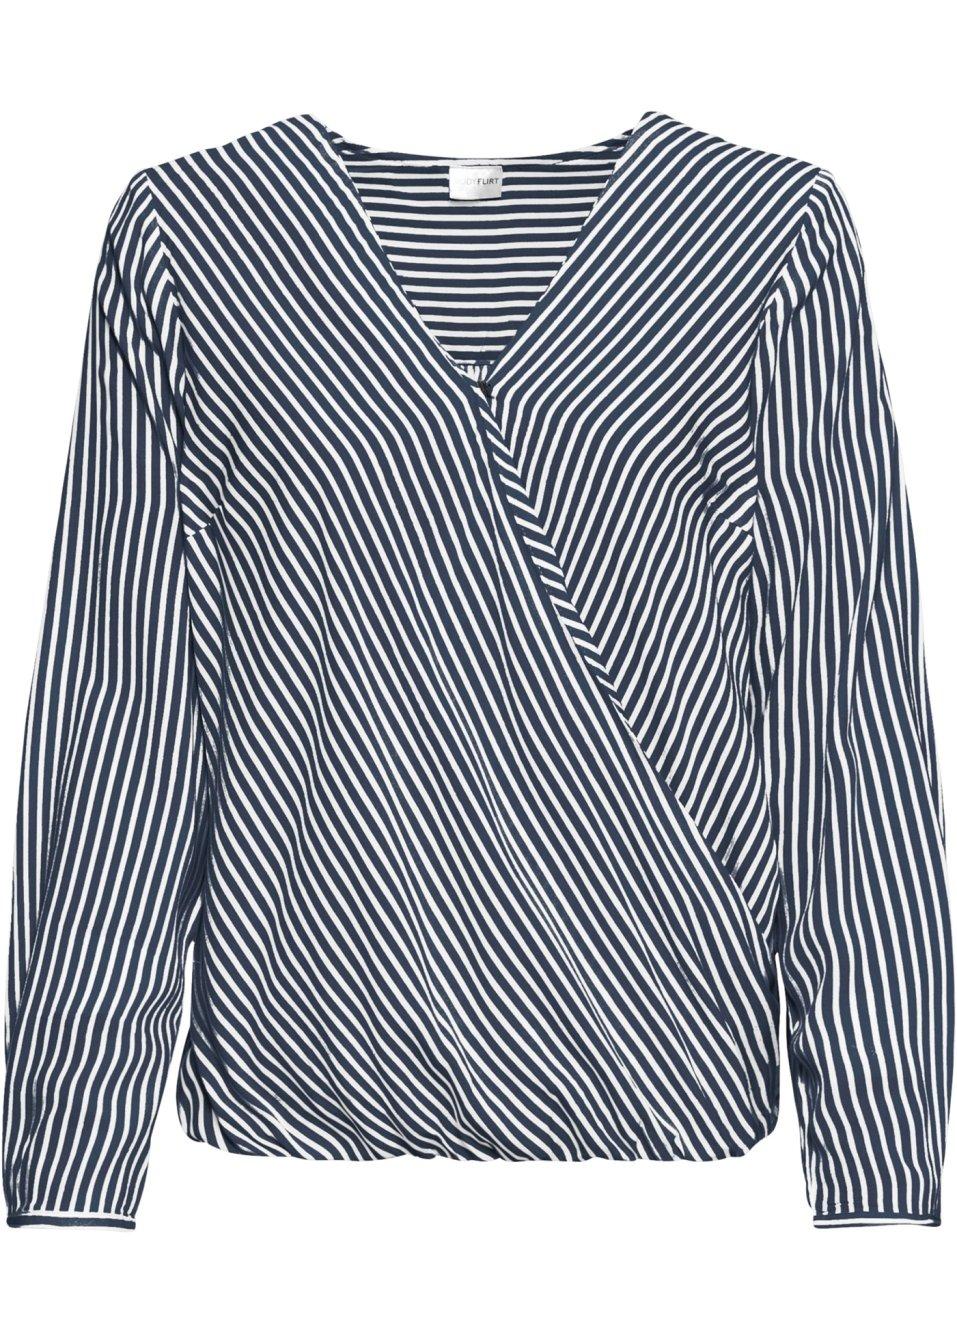 Bluse in Wickeloptik wollweiß/dunkelblau gestreift - BODYFLIRT online kaufen - bonprix.de iXuoc P1cQn